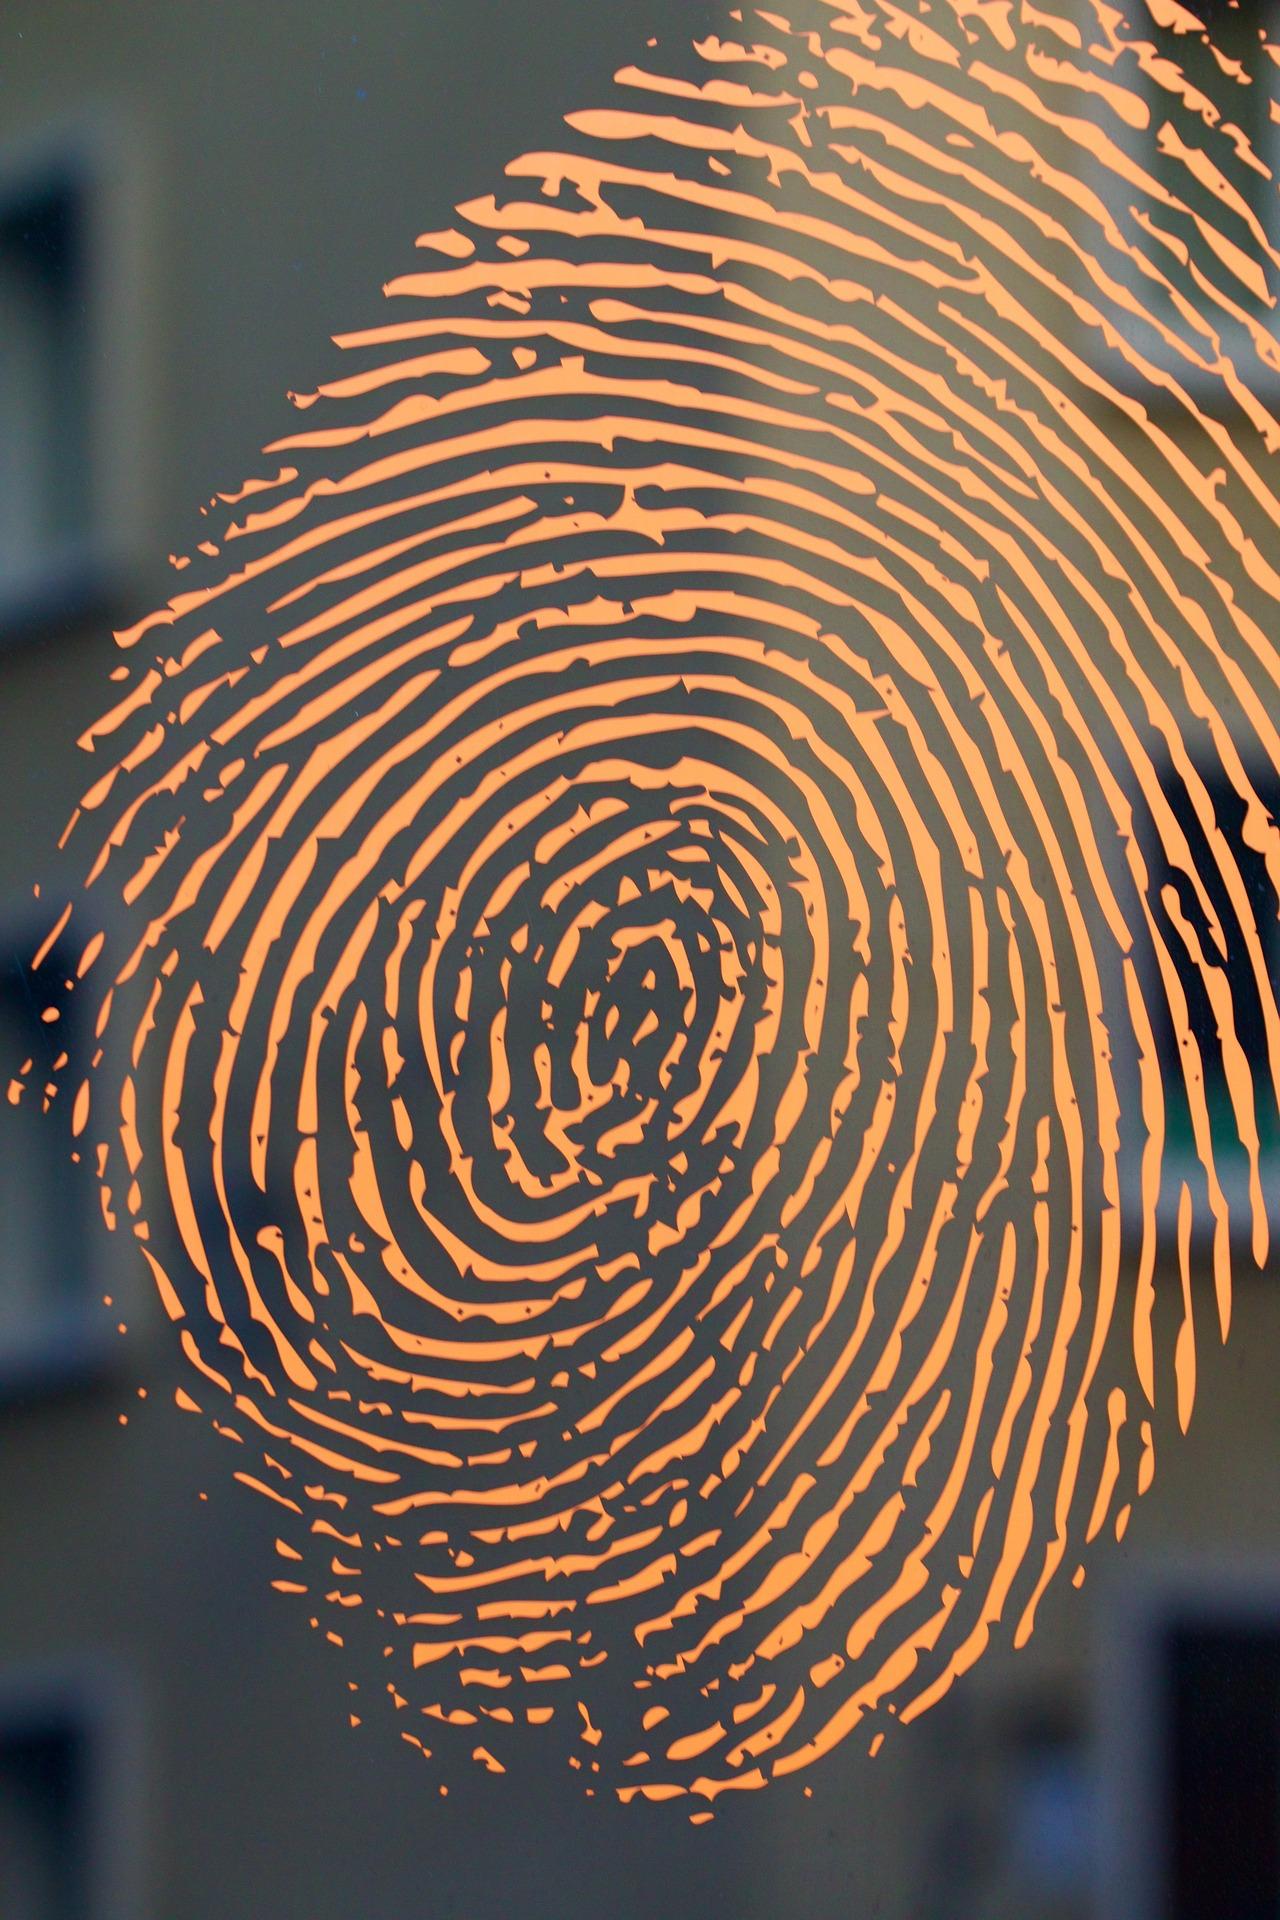 Informes periciales en ámbito penal